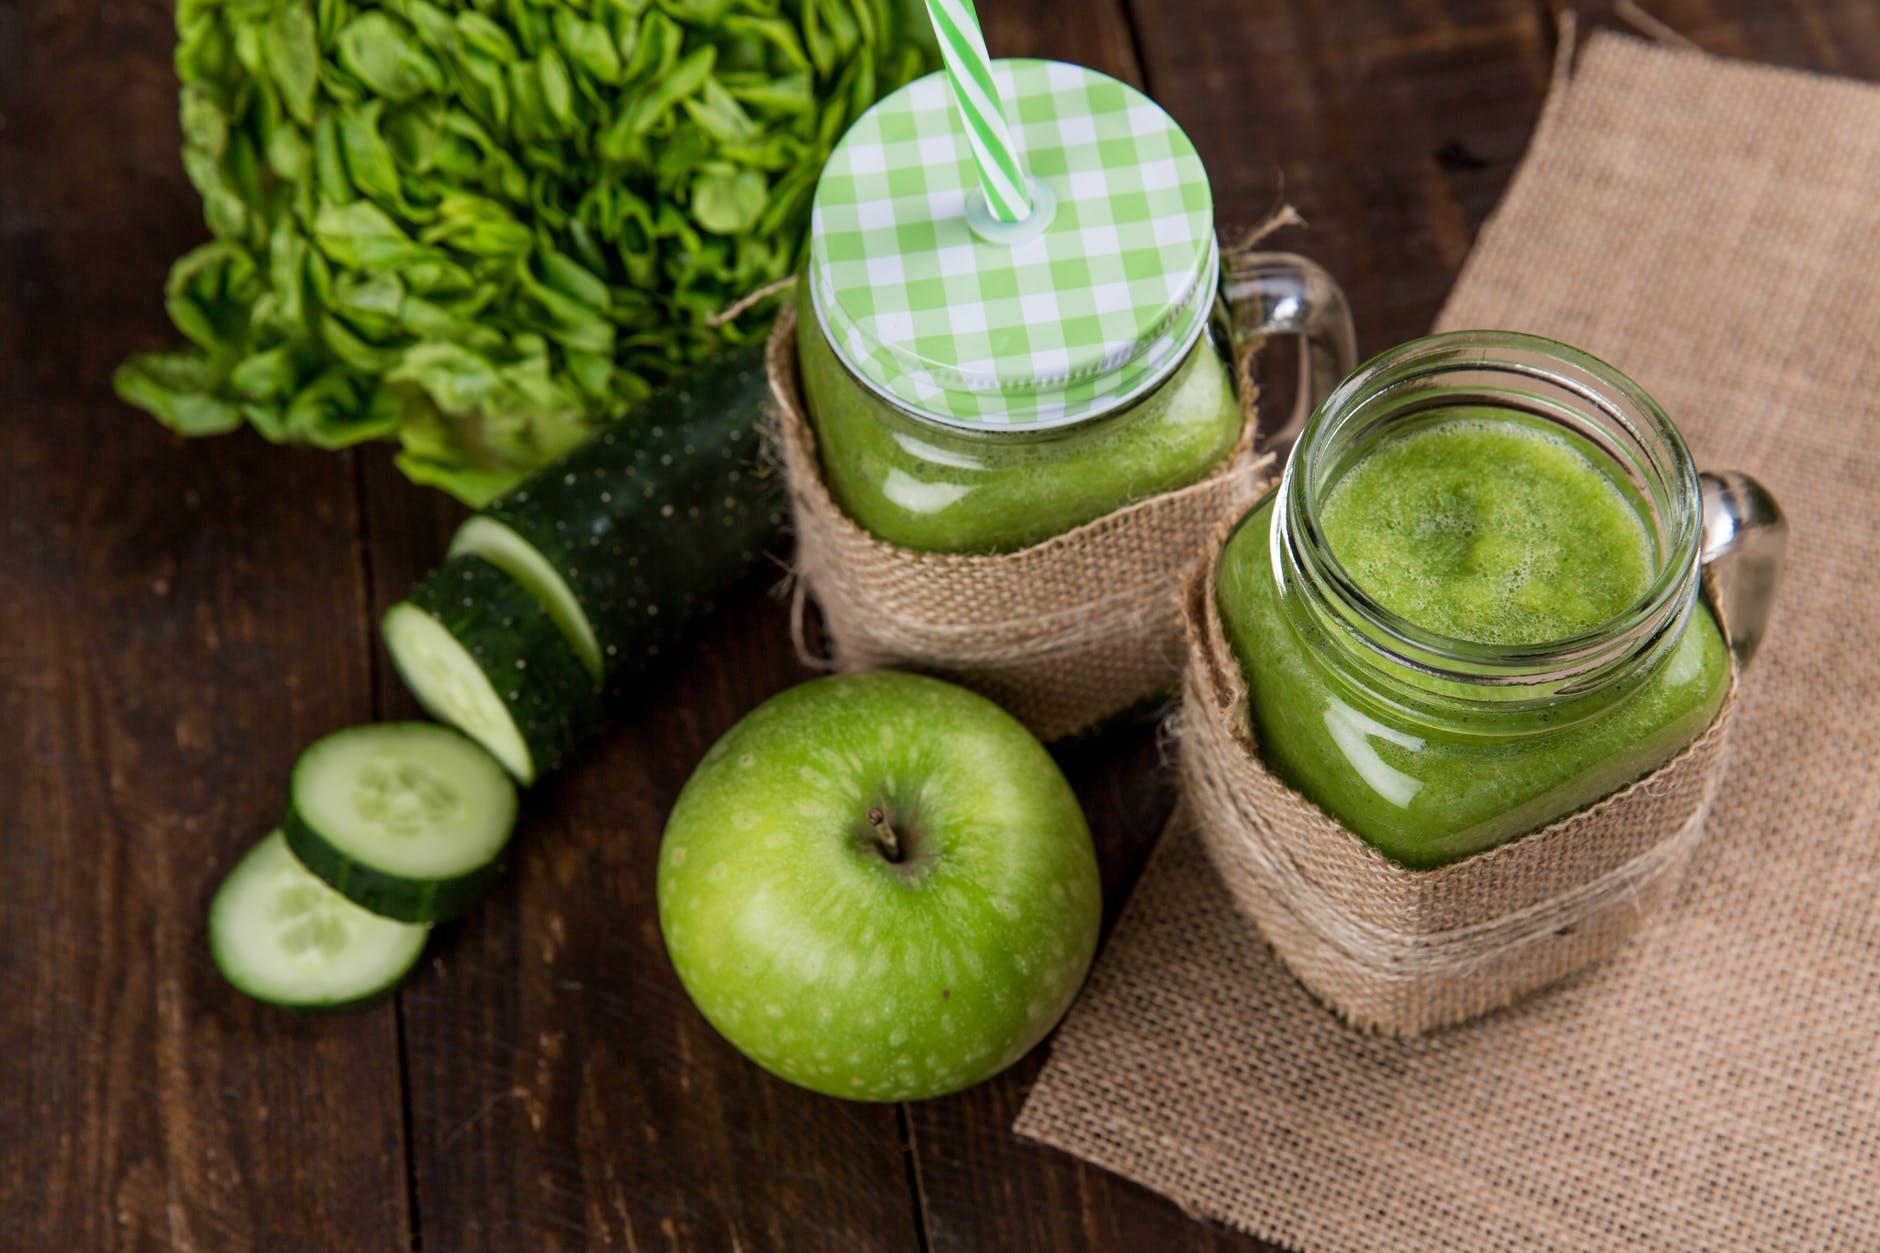 Cucumber lemon ginger juice benefits